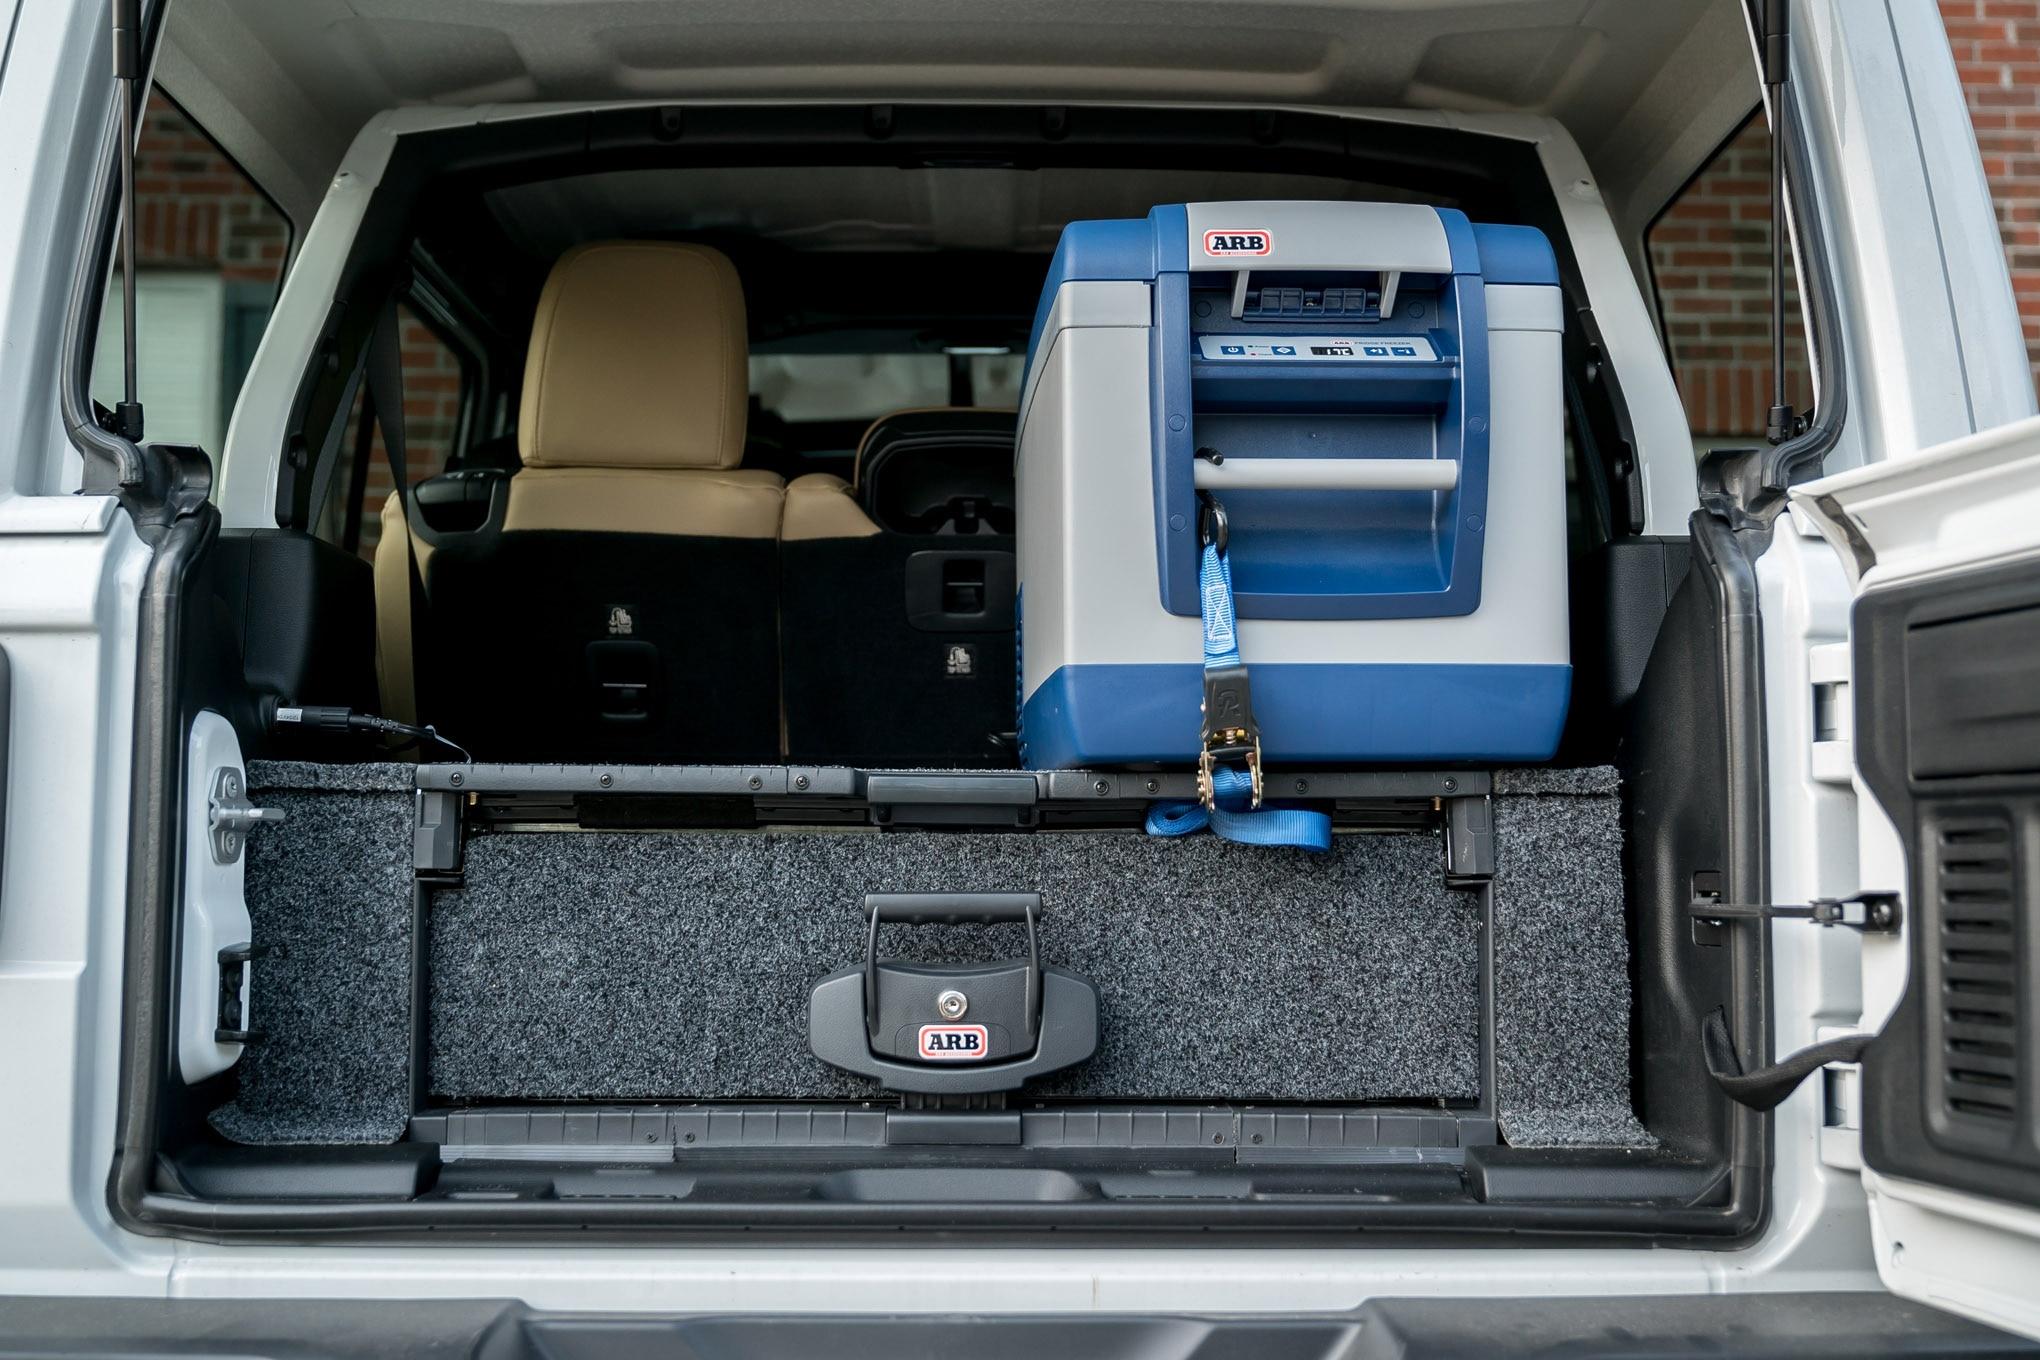 001 2018 jeep wrangler unlimited rubicon jl arb drawer system cargo organizer